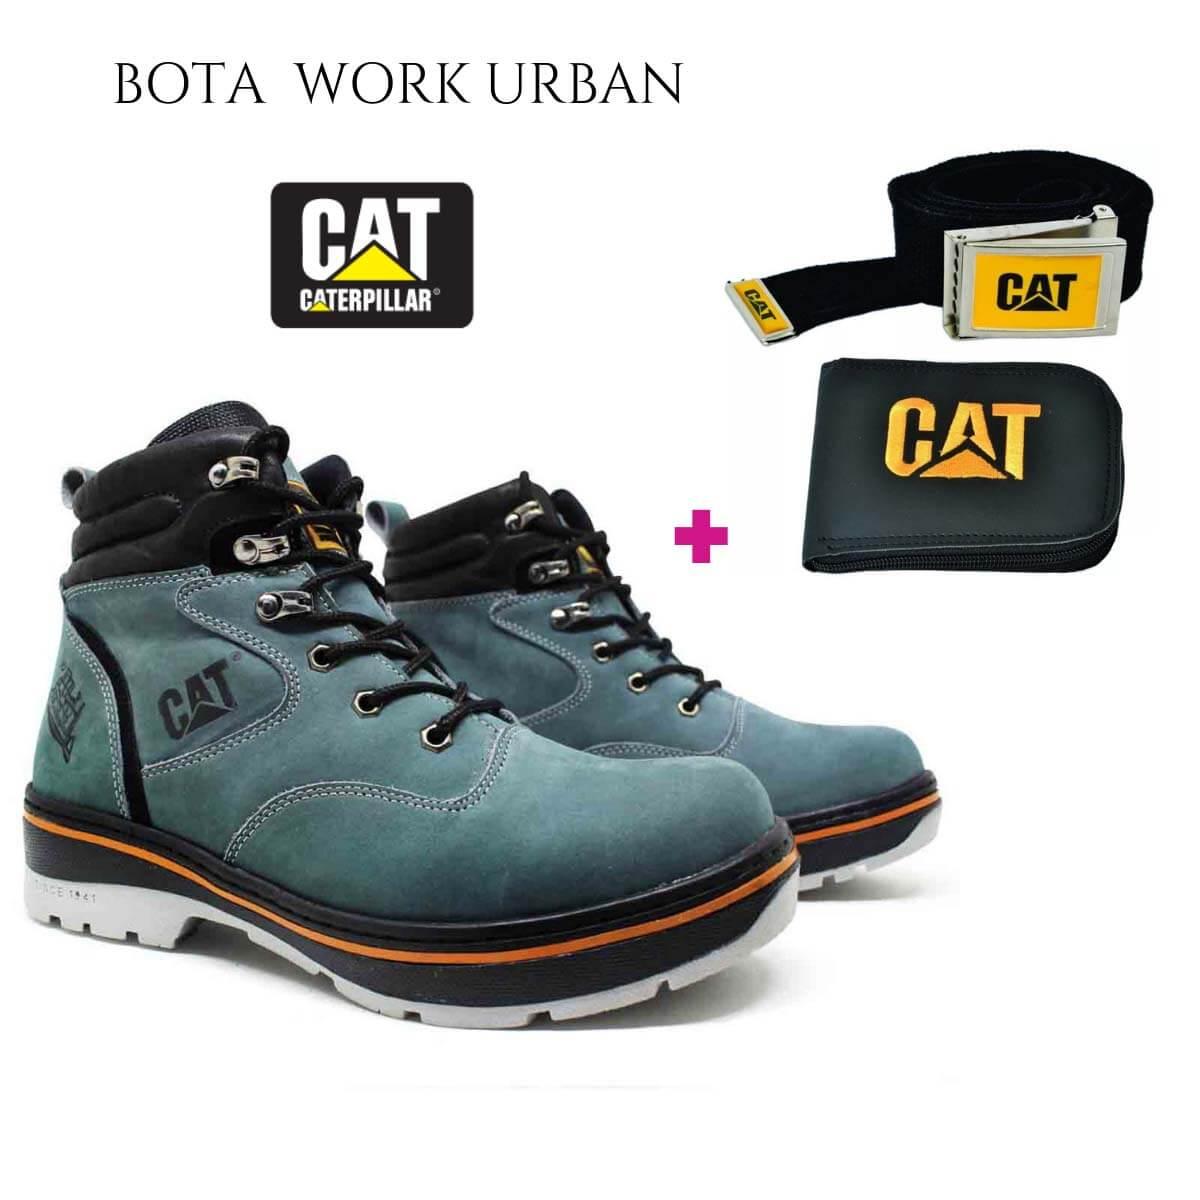 Bota Coturno Caterpillar Work Urban Couro Cinza + Brinde Carteira e Cinto Cat